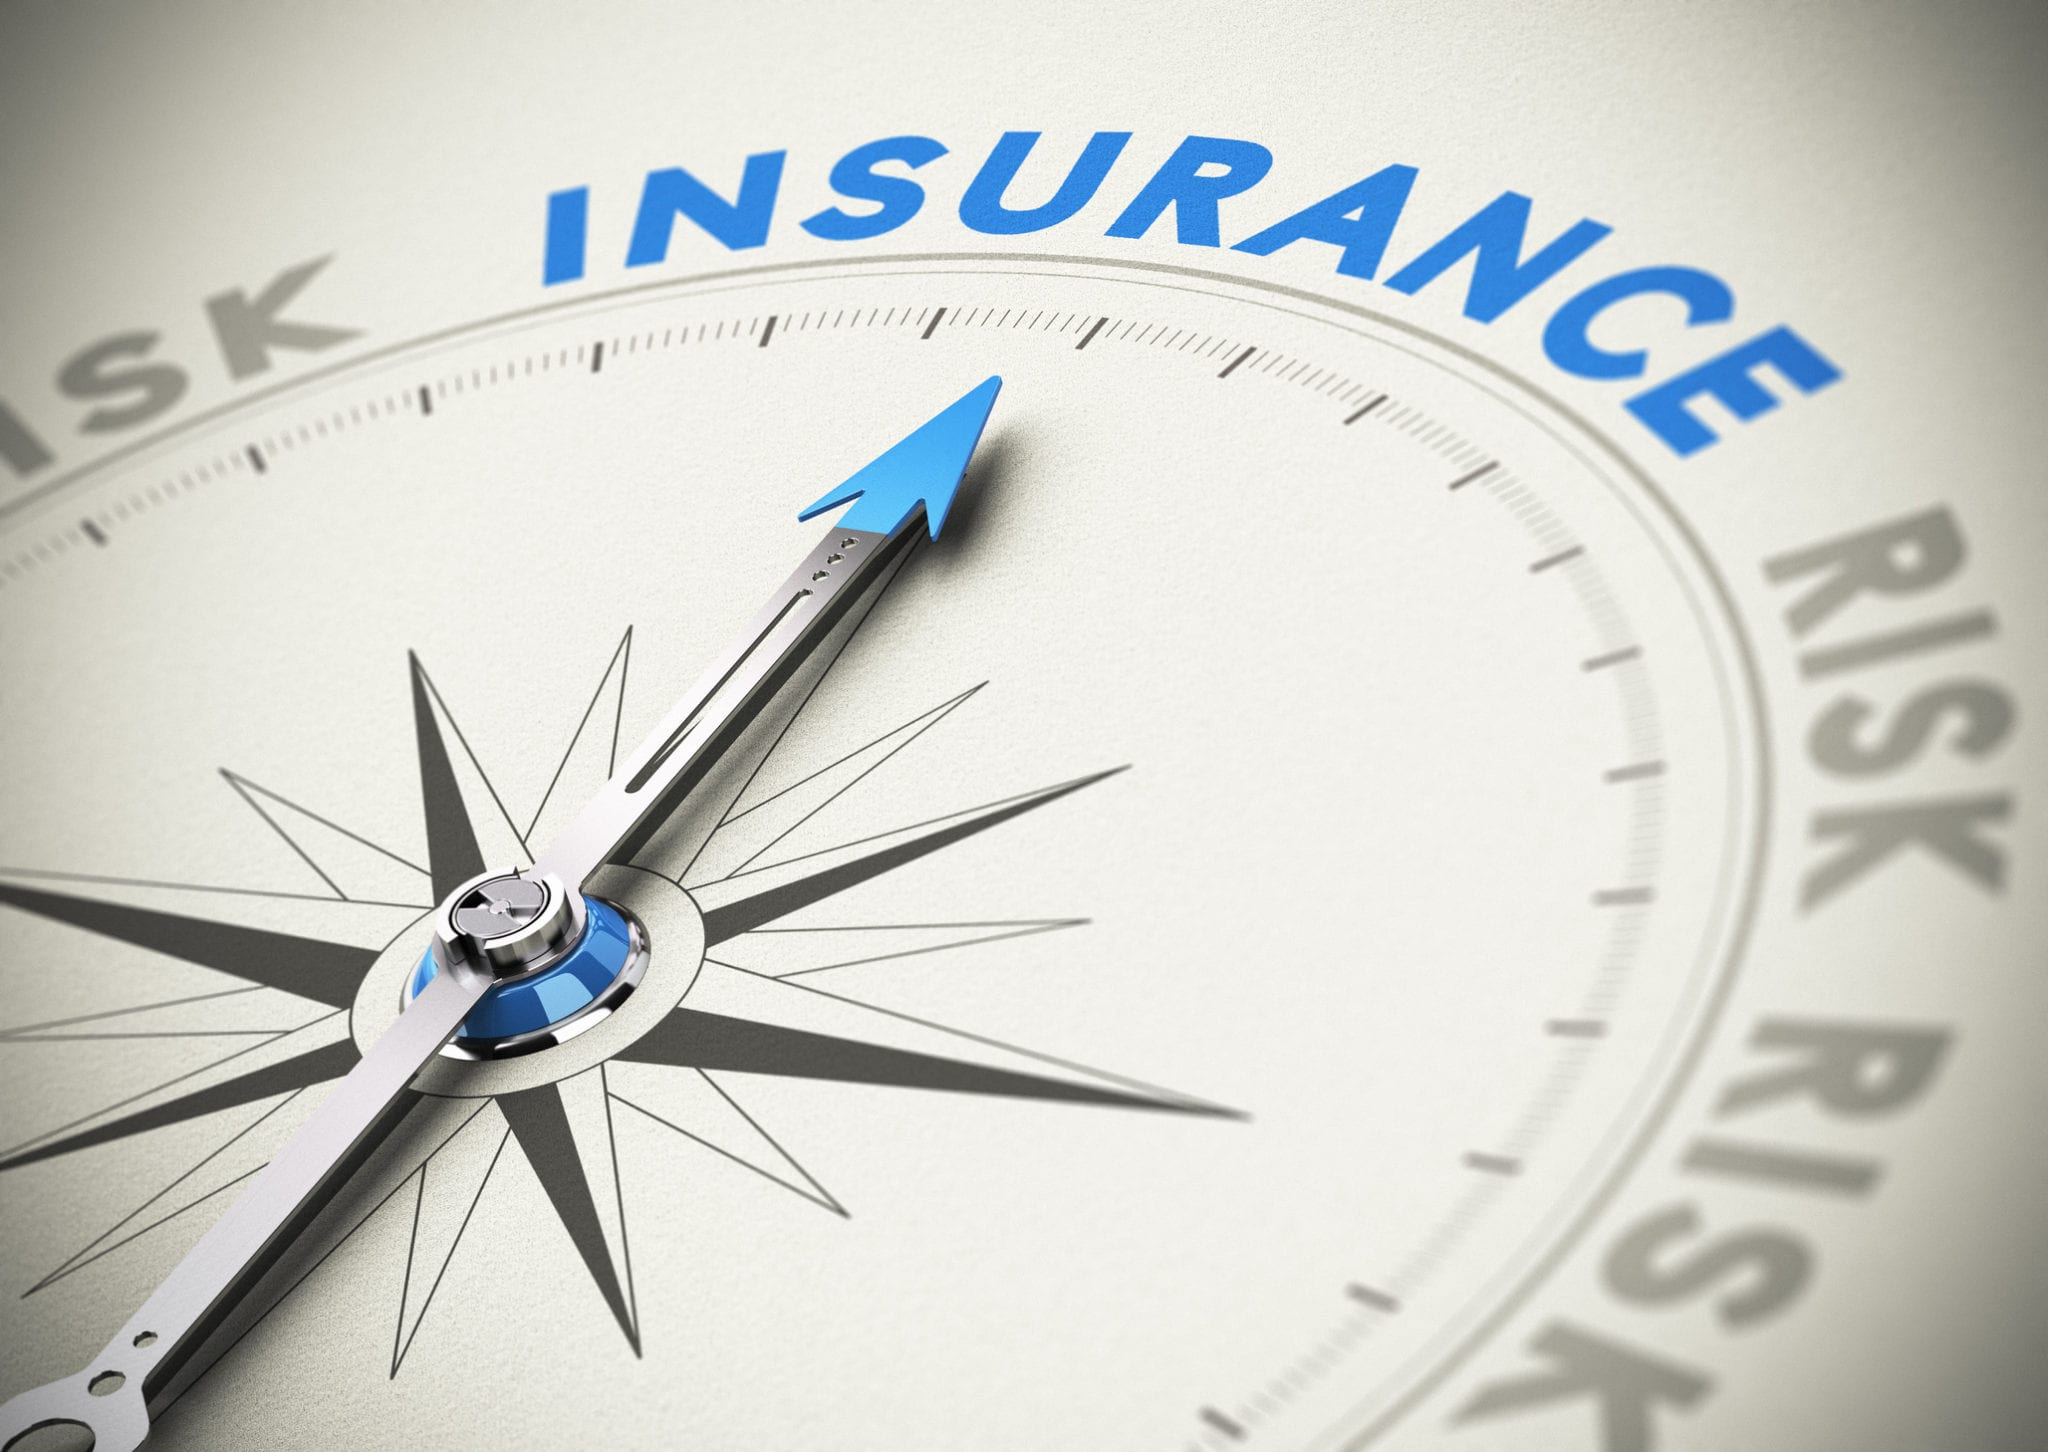 Hard Market Insurance